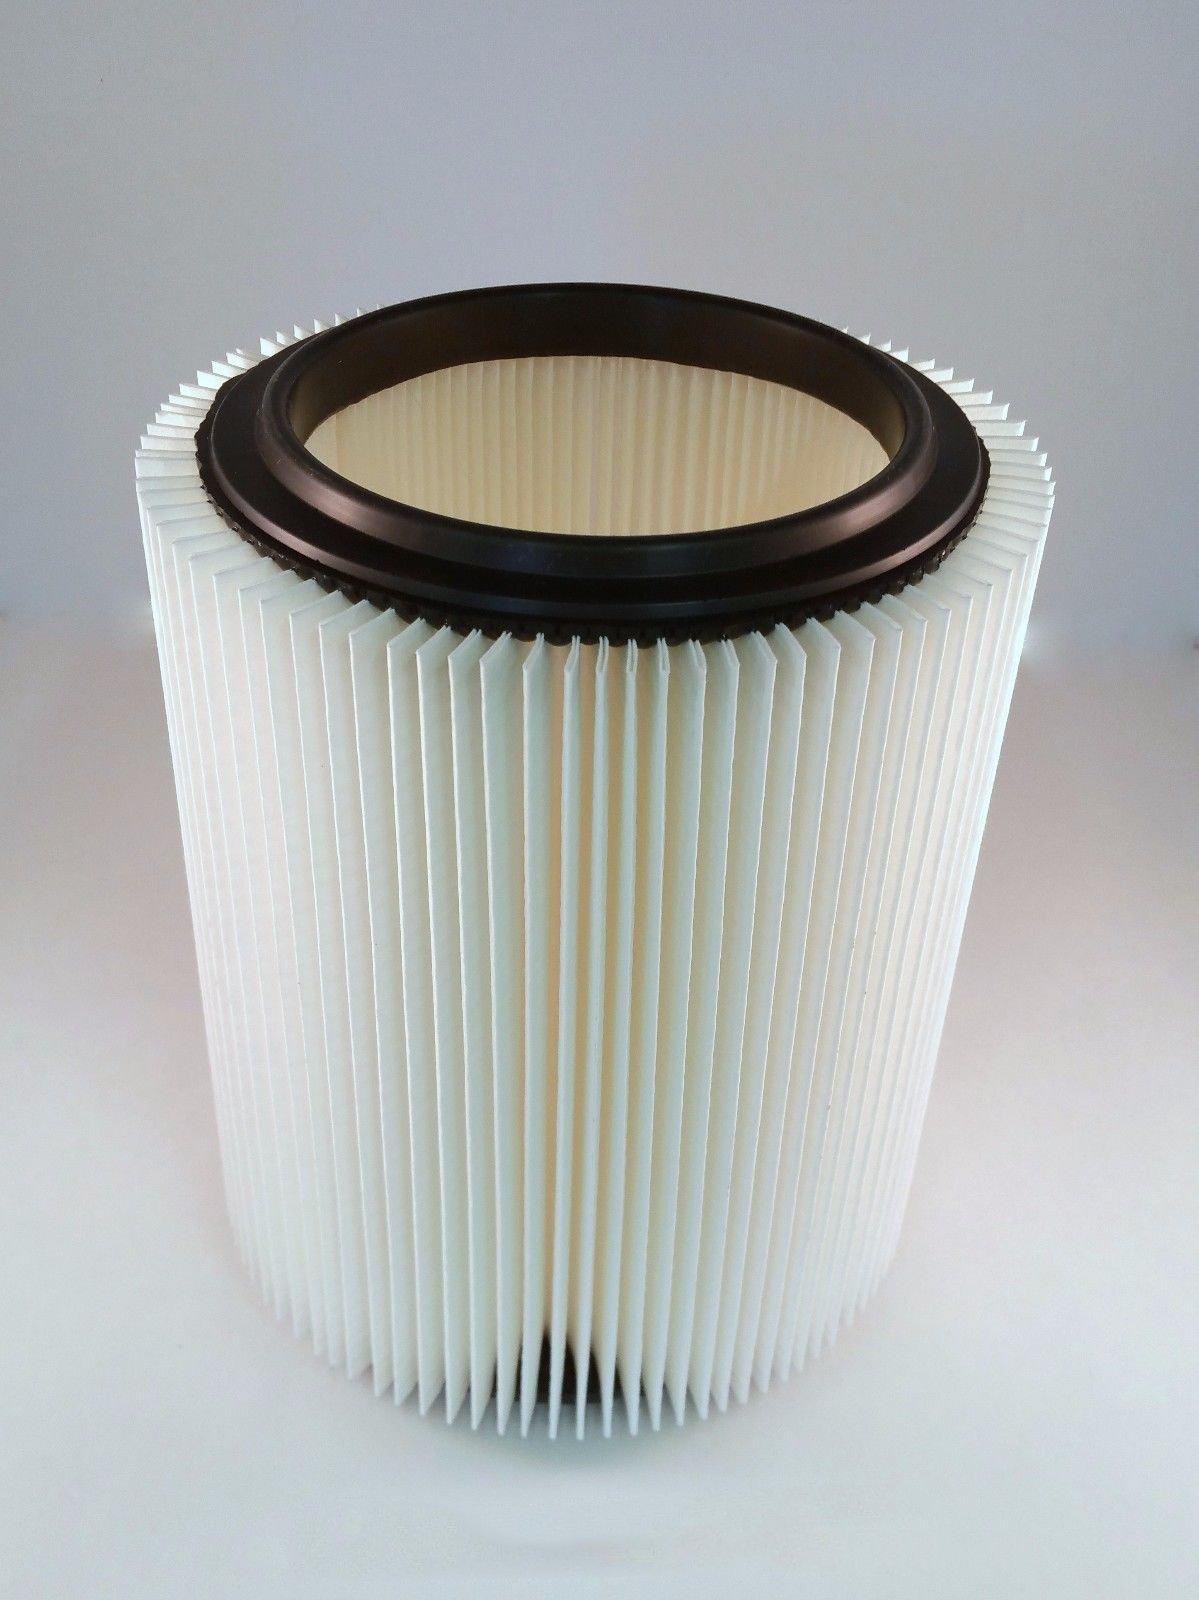 Shop Vac Filter- Wet/Dry Vac Air Filter by Ximoon for Craftsman & Ridgid Vacuums Replace Craftsman 17816, 9-17816 & Ridgid VF4000 VF4200